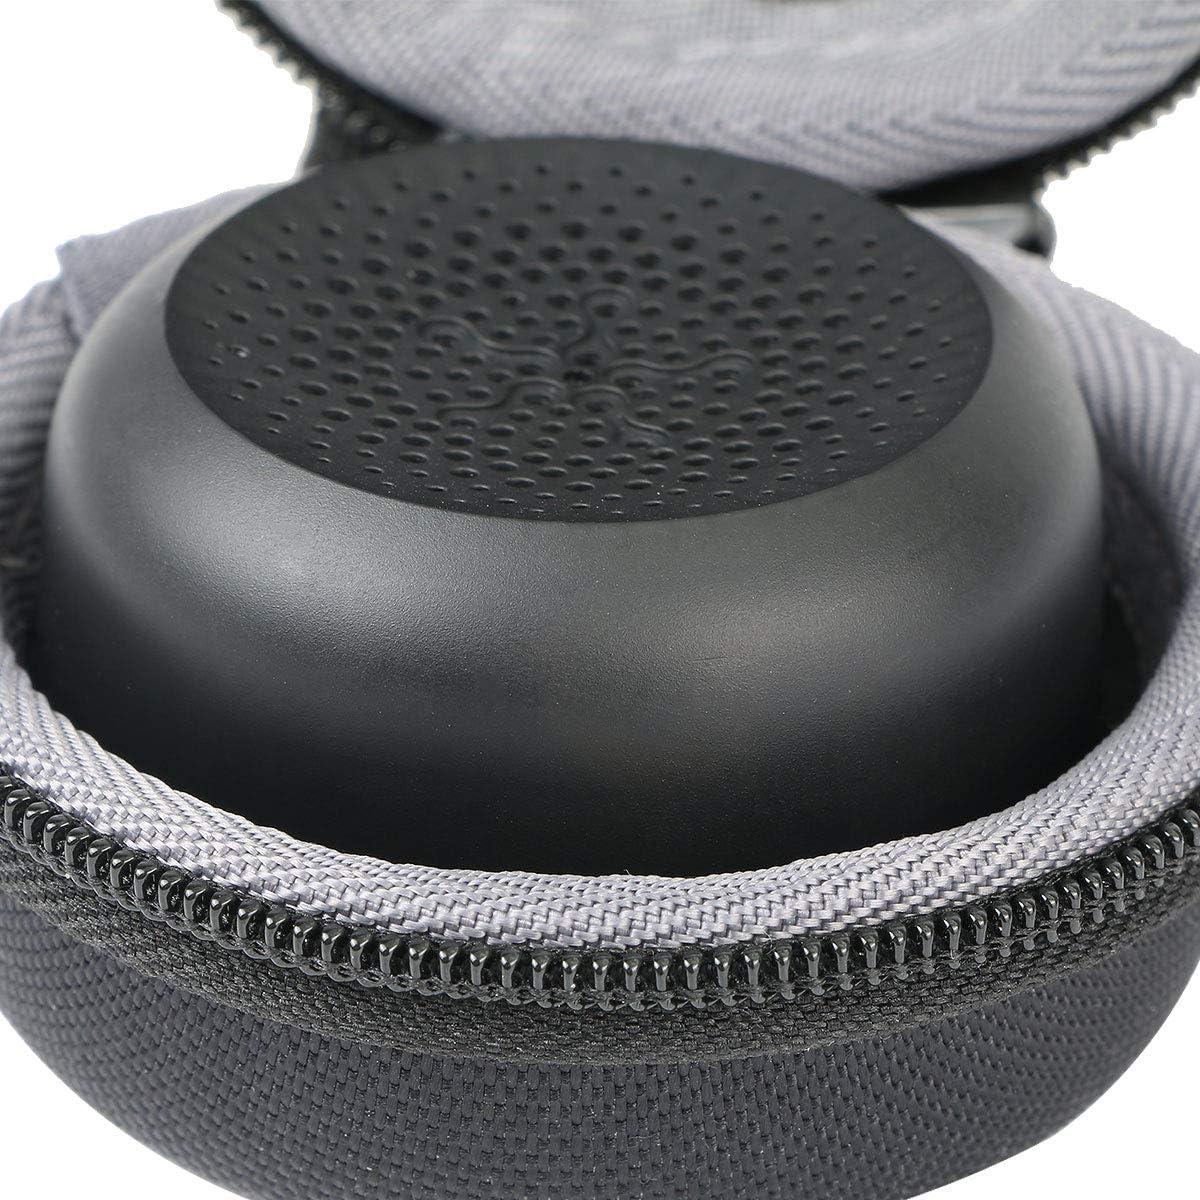 co2crea Hard Travel Case Replacement for Anker Soundcore Ace A0 Bluetooth Portable Mini Speaker